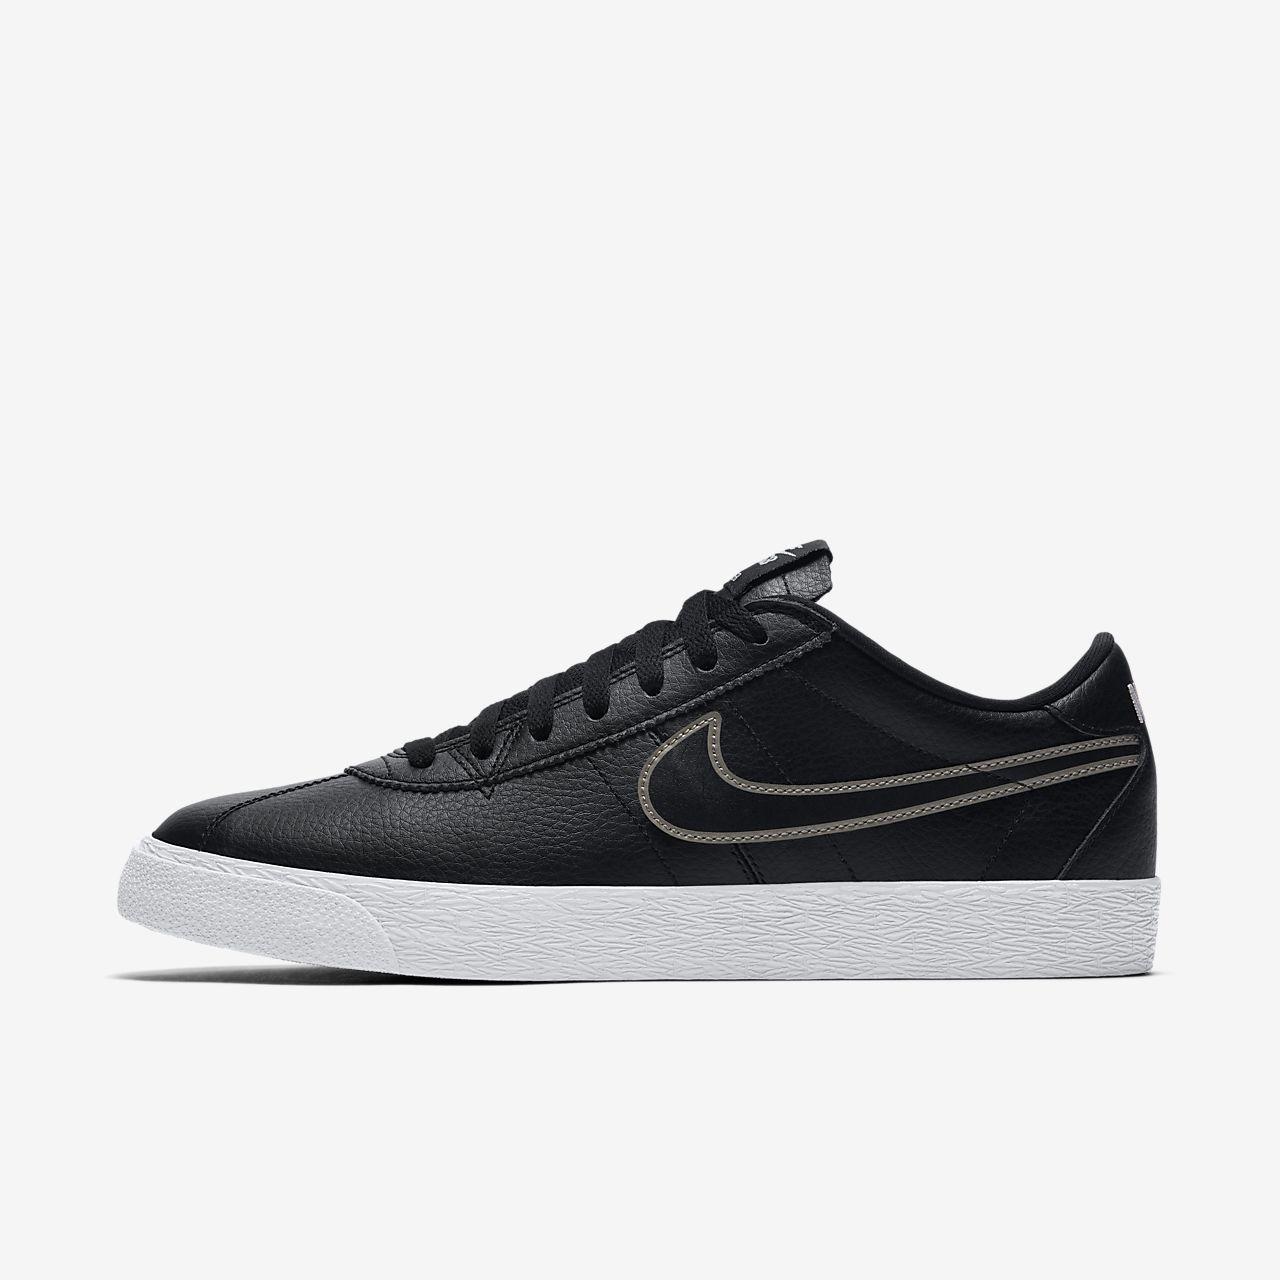 ... Calzado de skateboarding para hombre Nike SB Zoom Bruin Premium SE